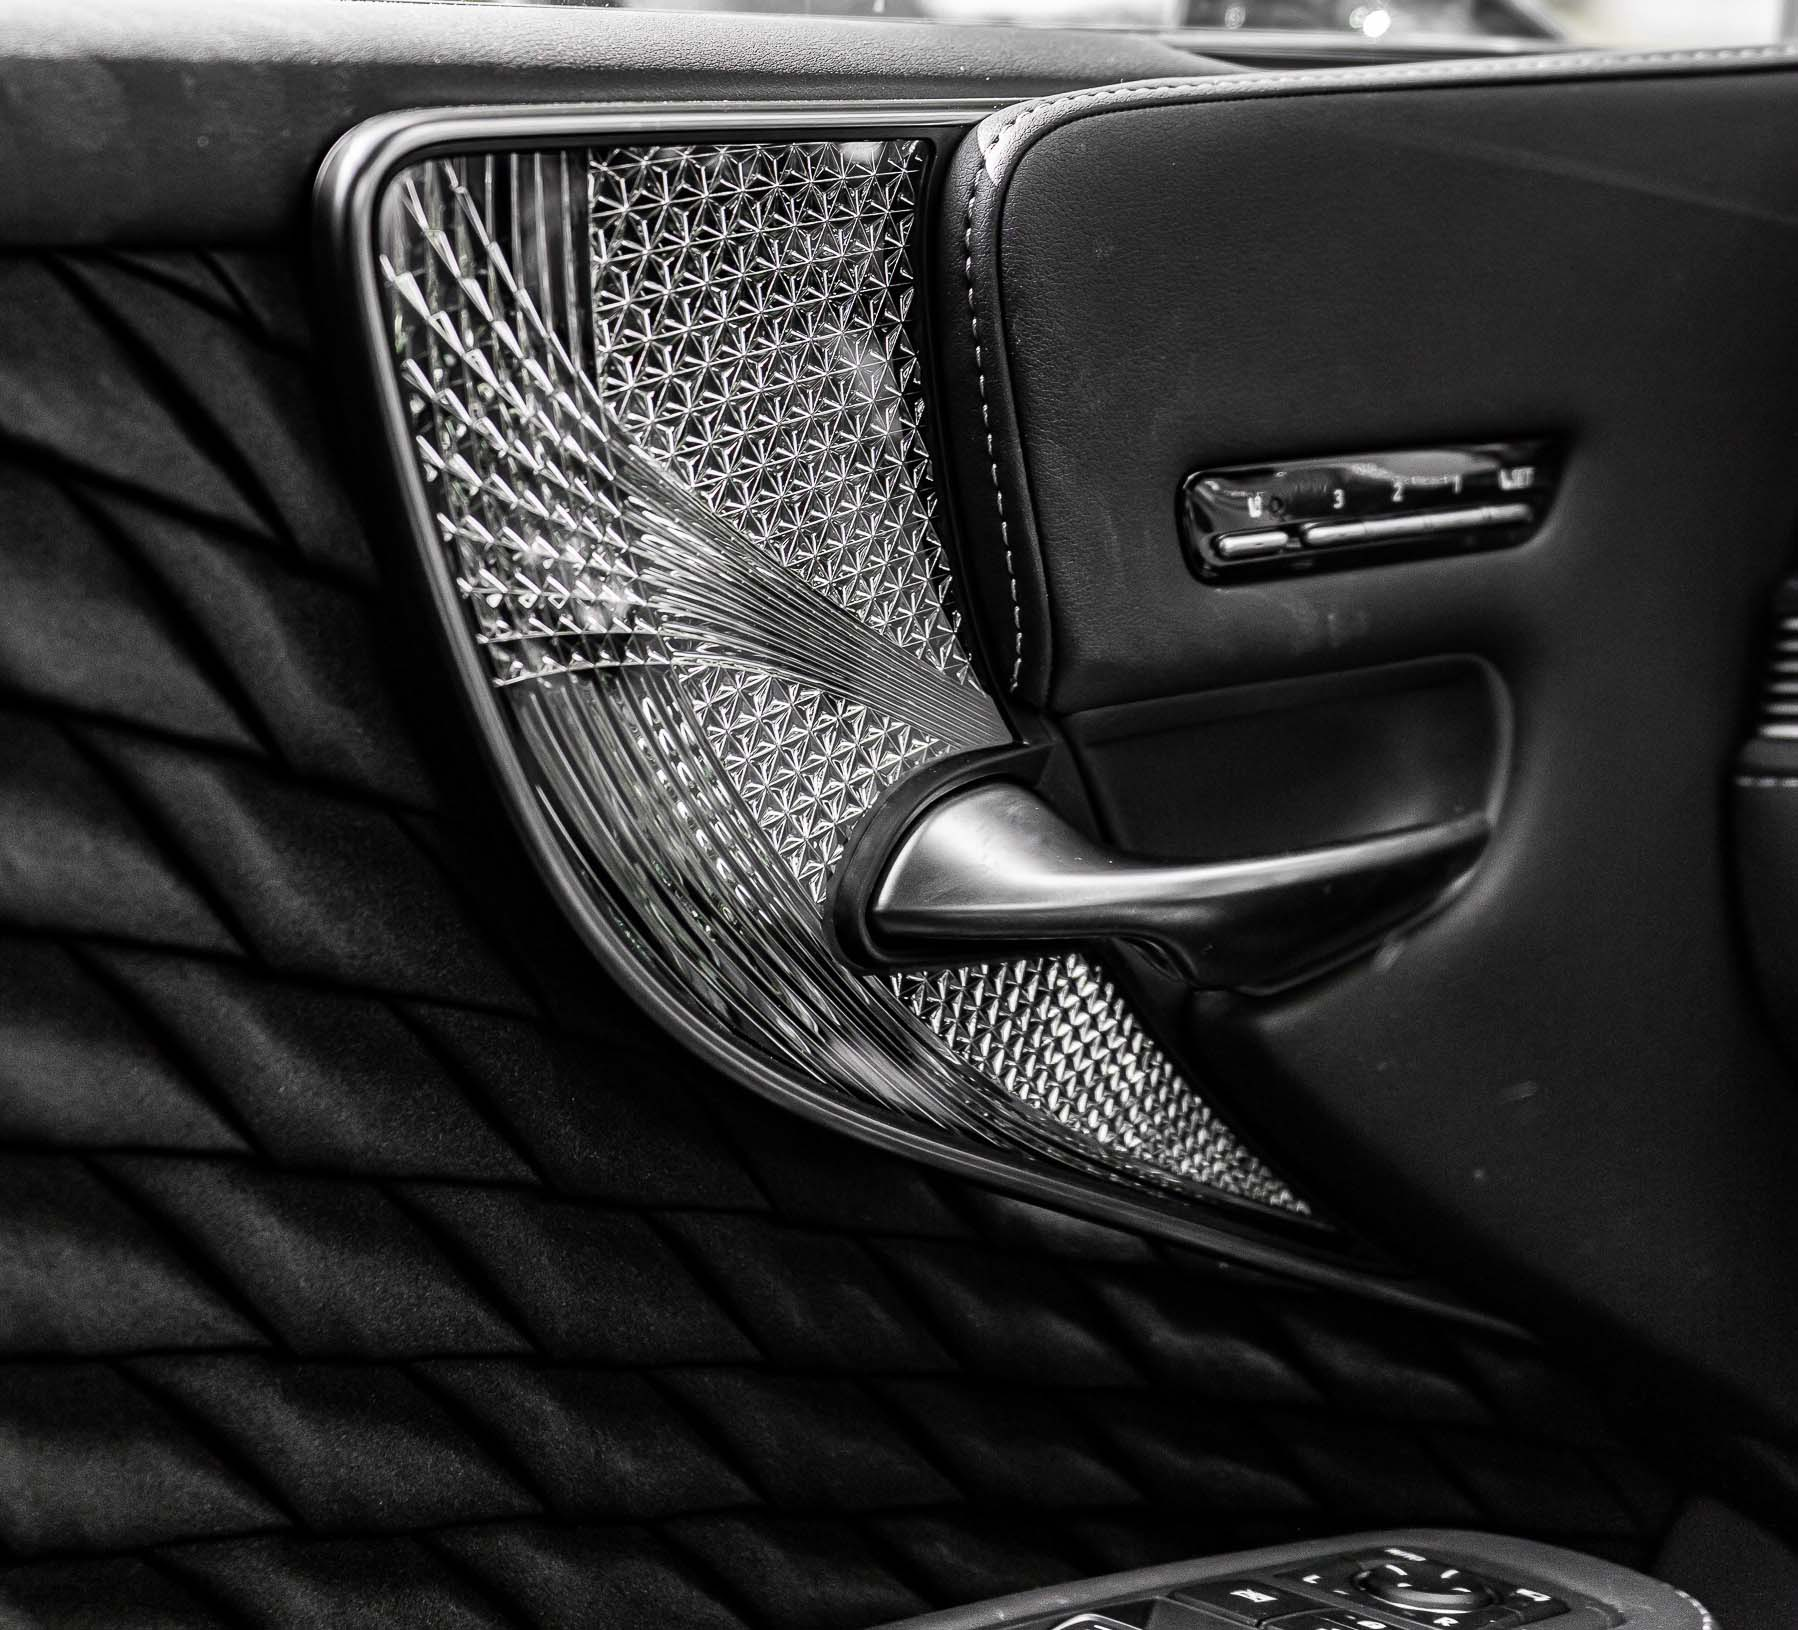 2019 Lexus LS 500h Luxury Sedan: Paragon Of Excellence